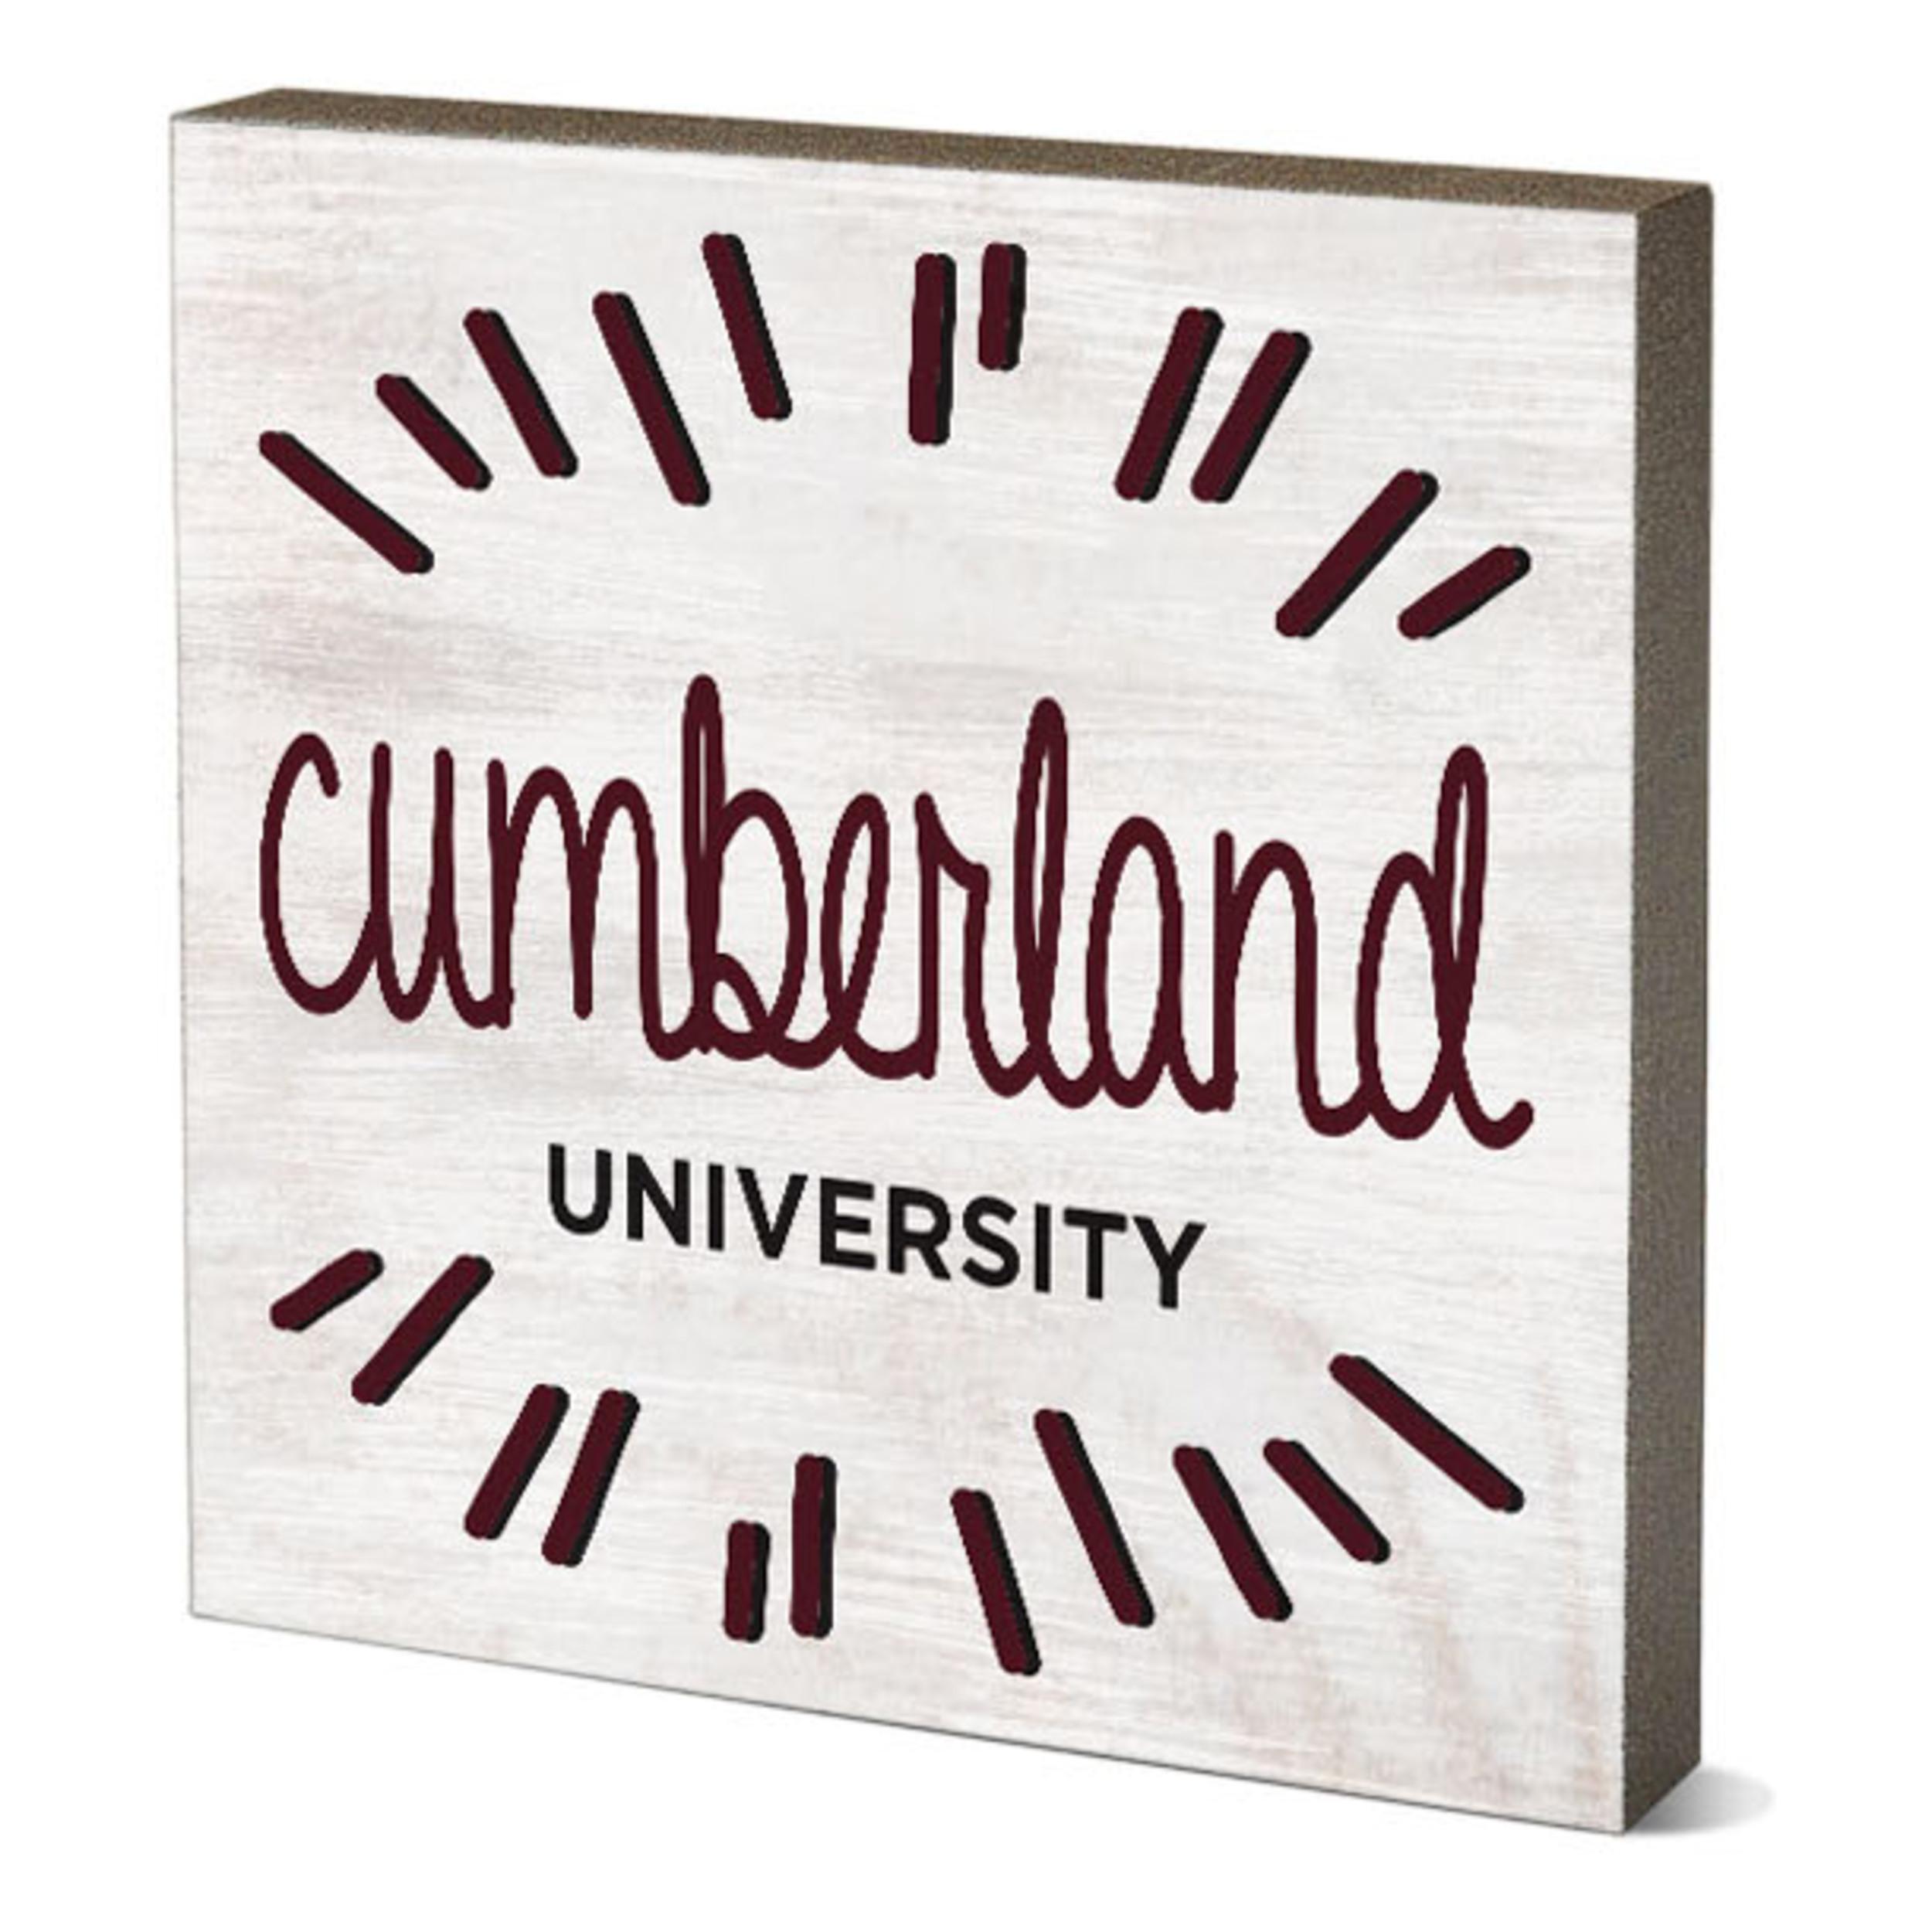 "Cumberland University Burst Table Top Square 5.5"" x 5.5"""